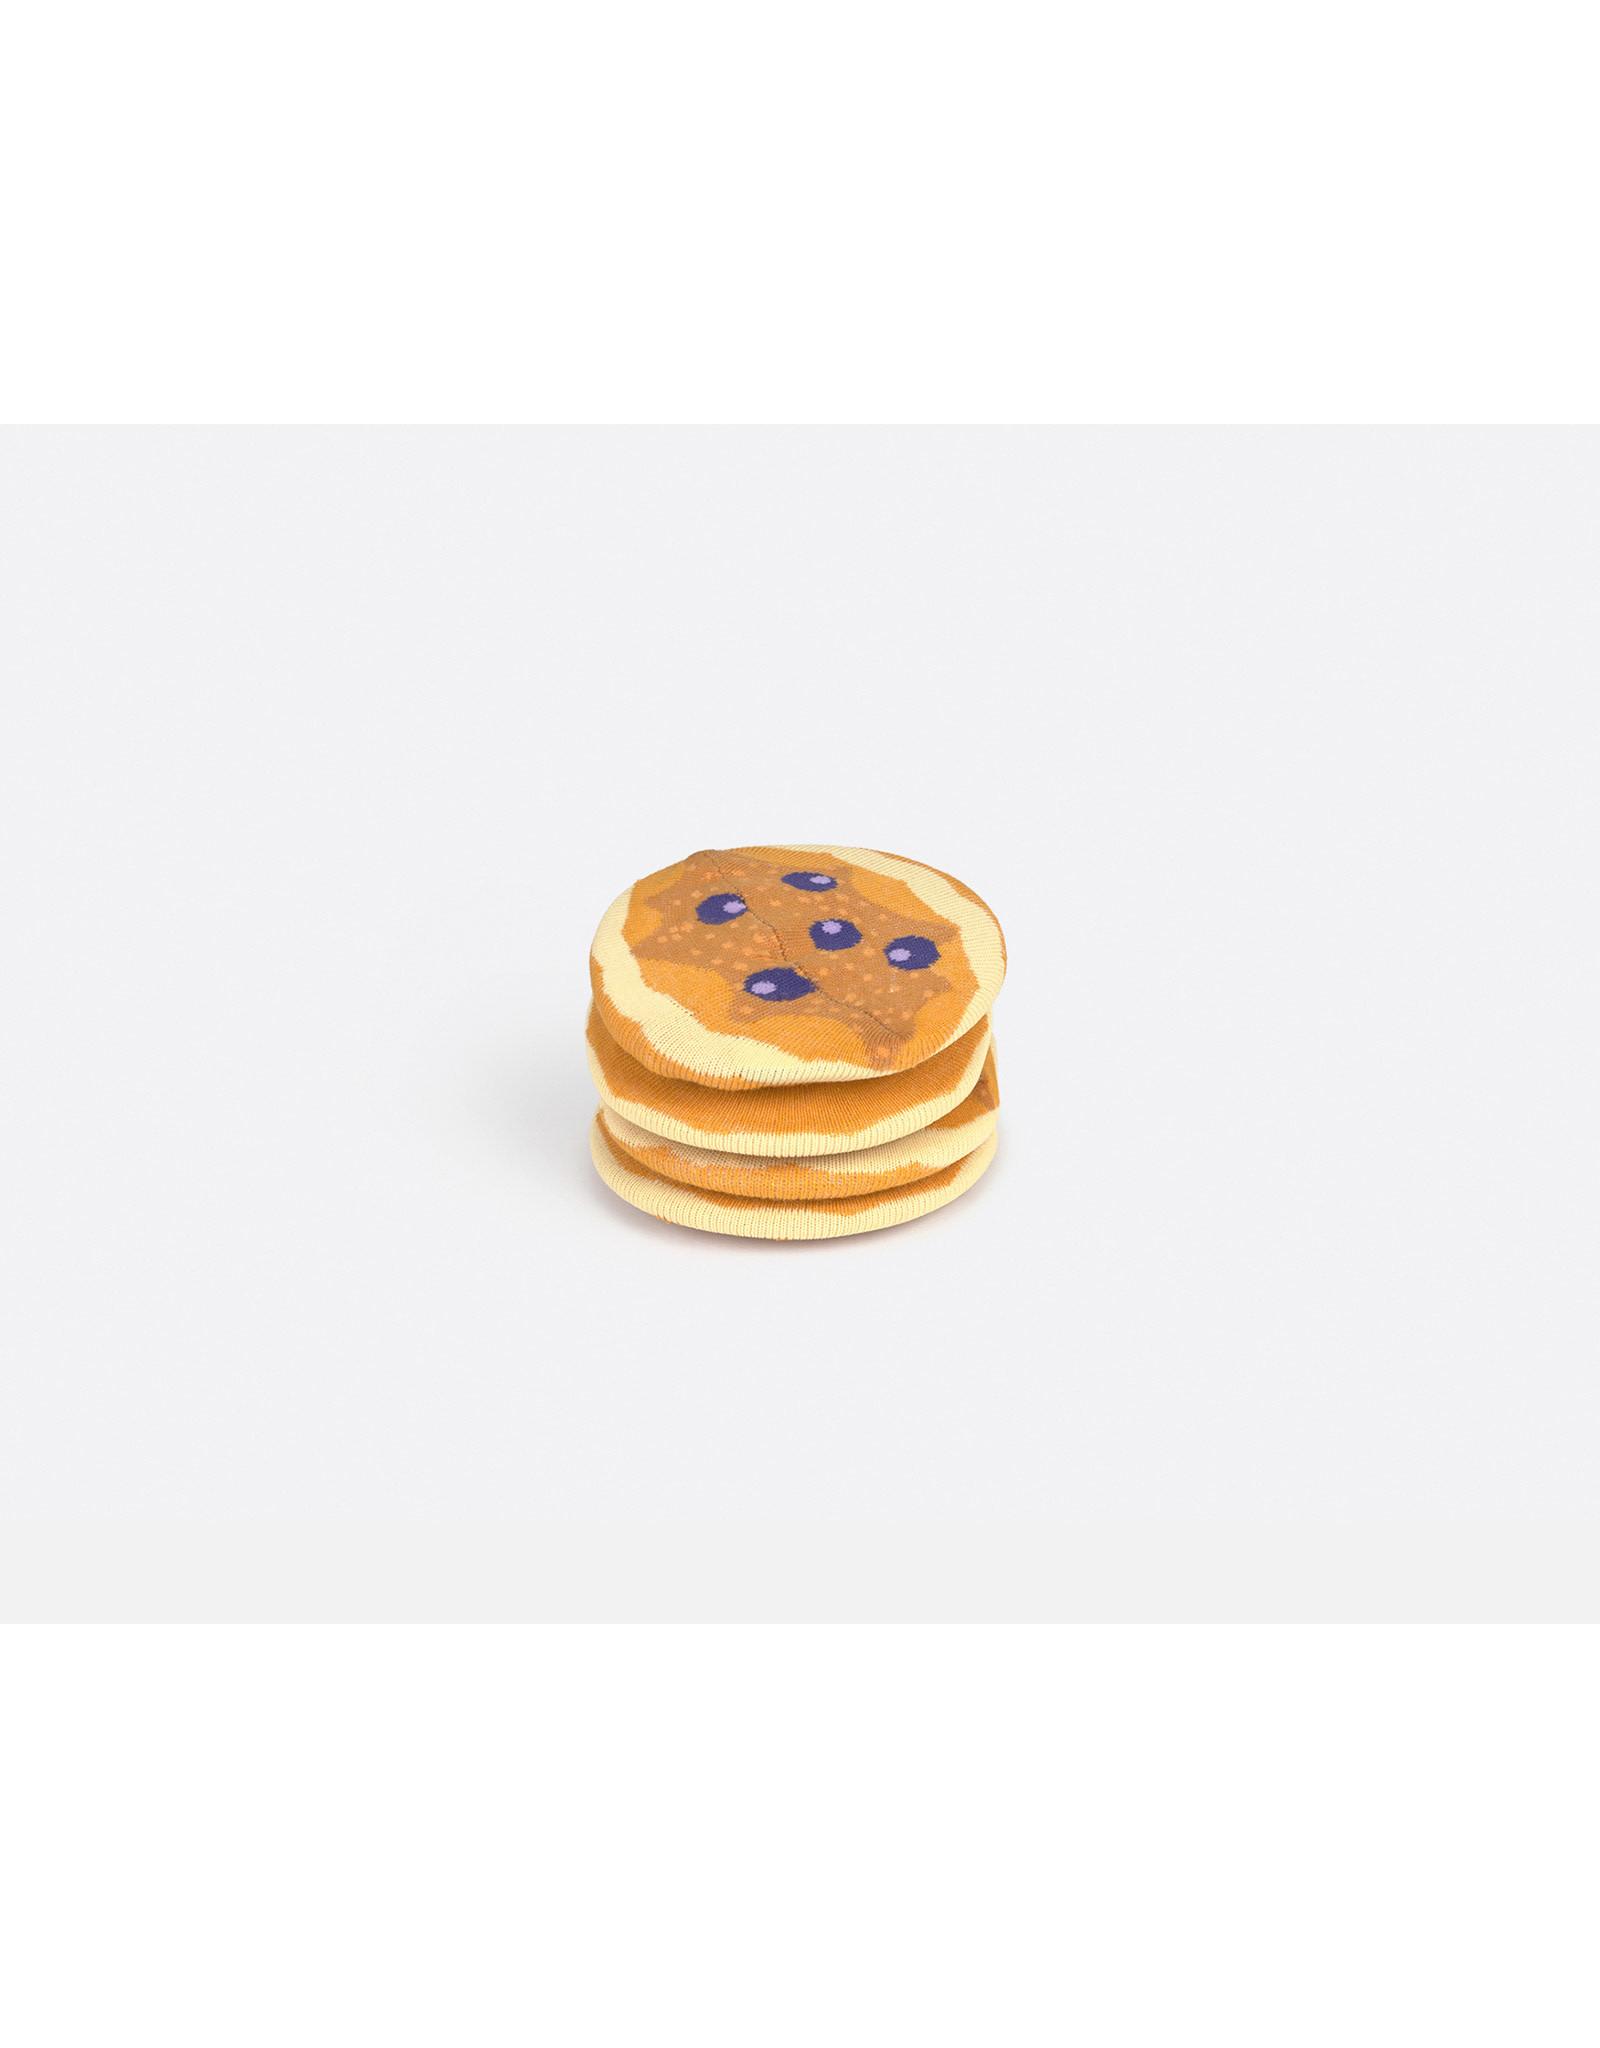 socks with pancake design